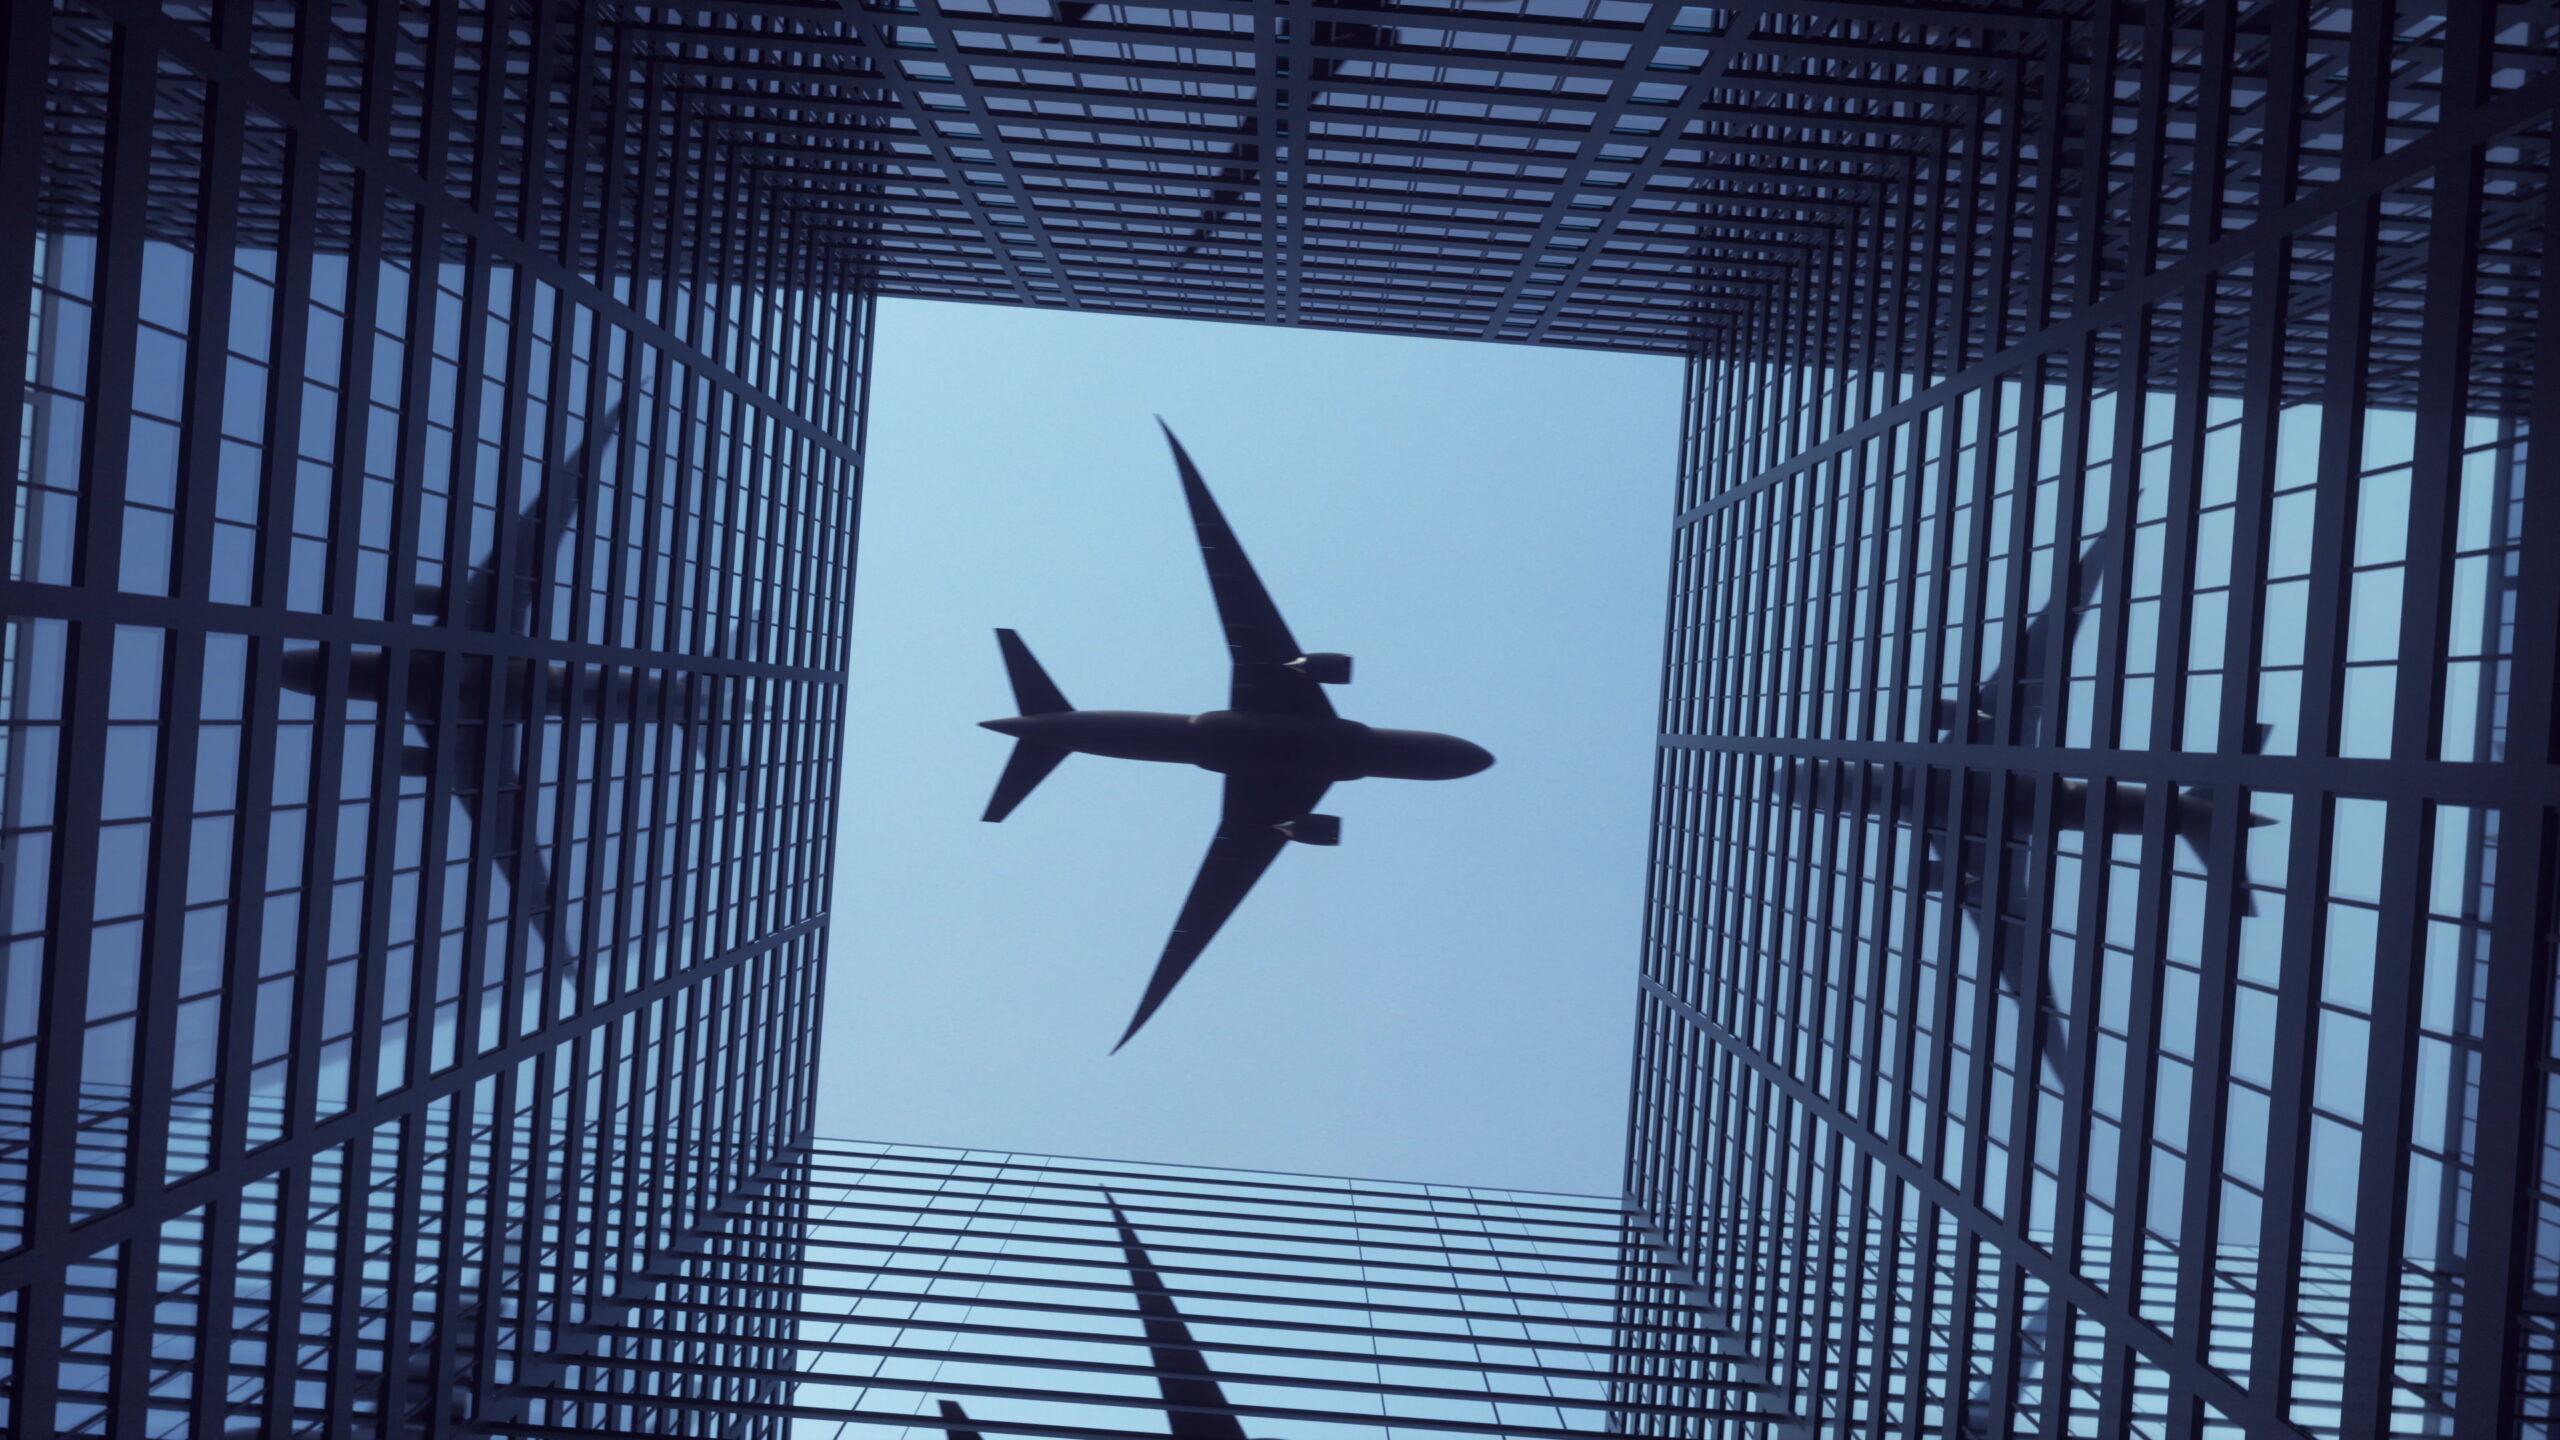 Боинг самолет полет Далас